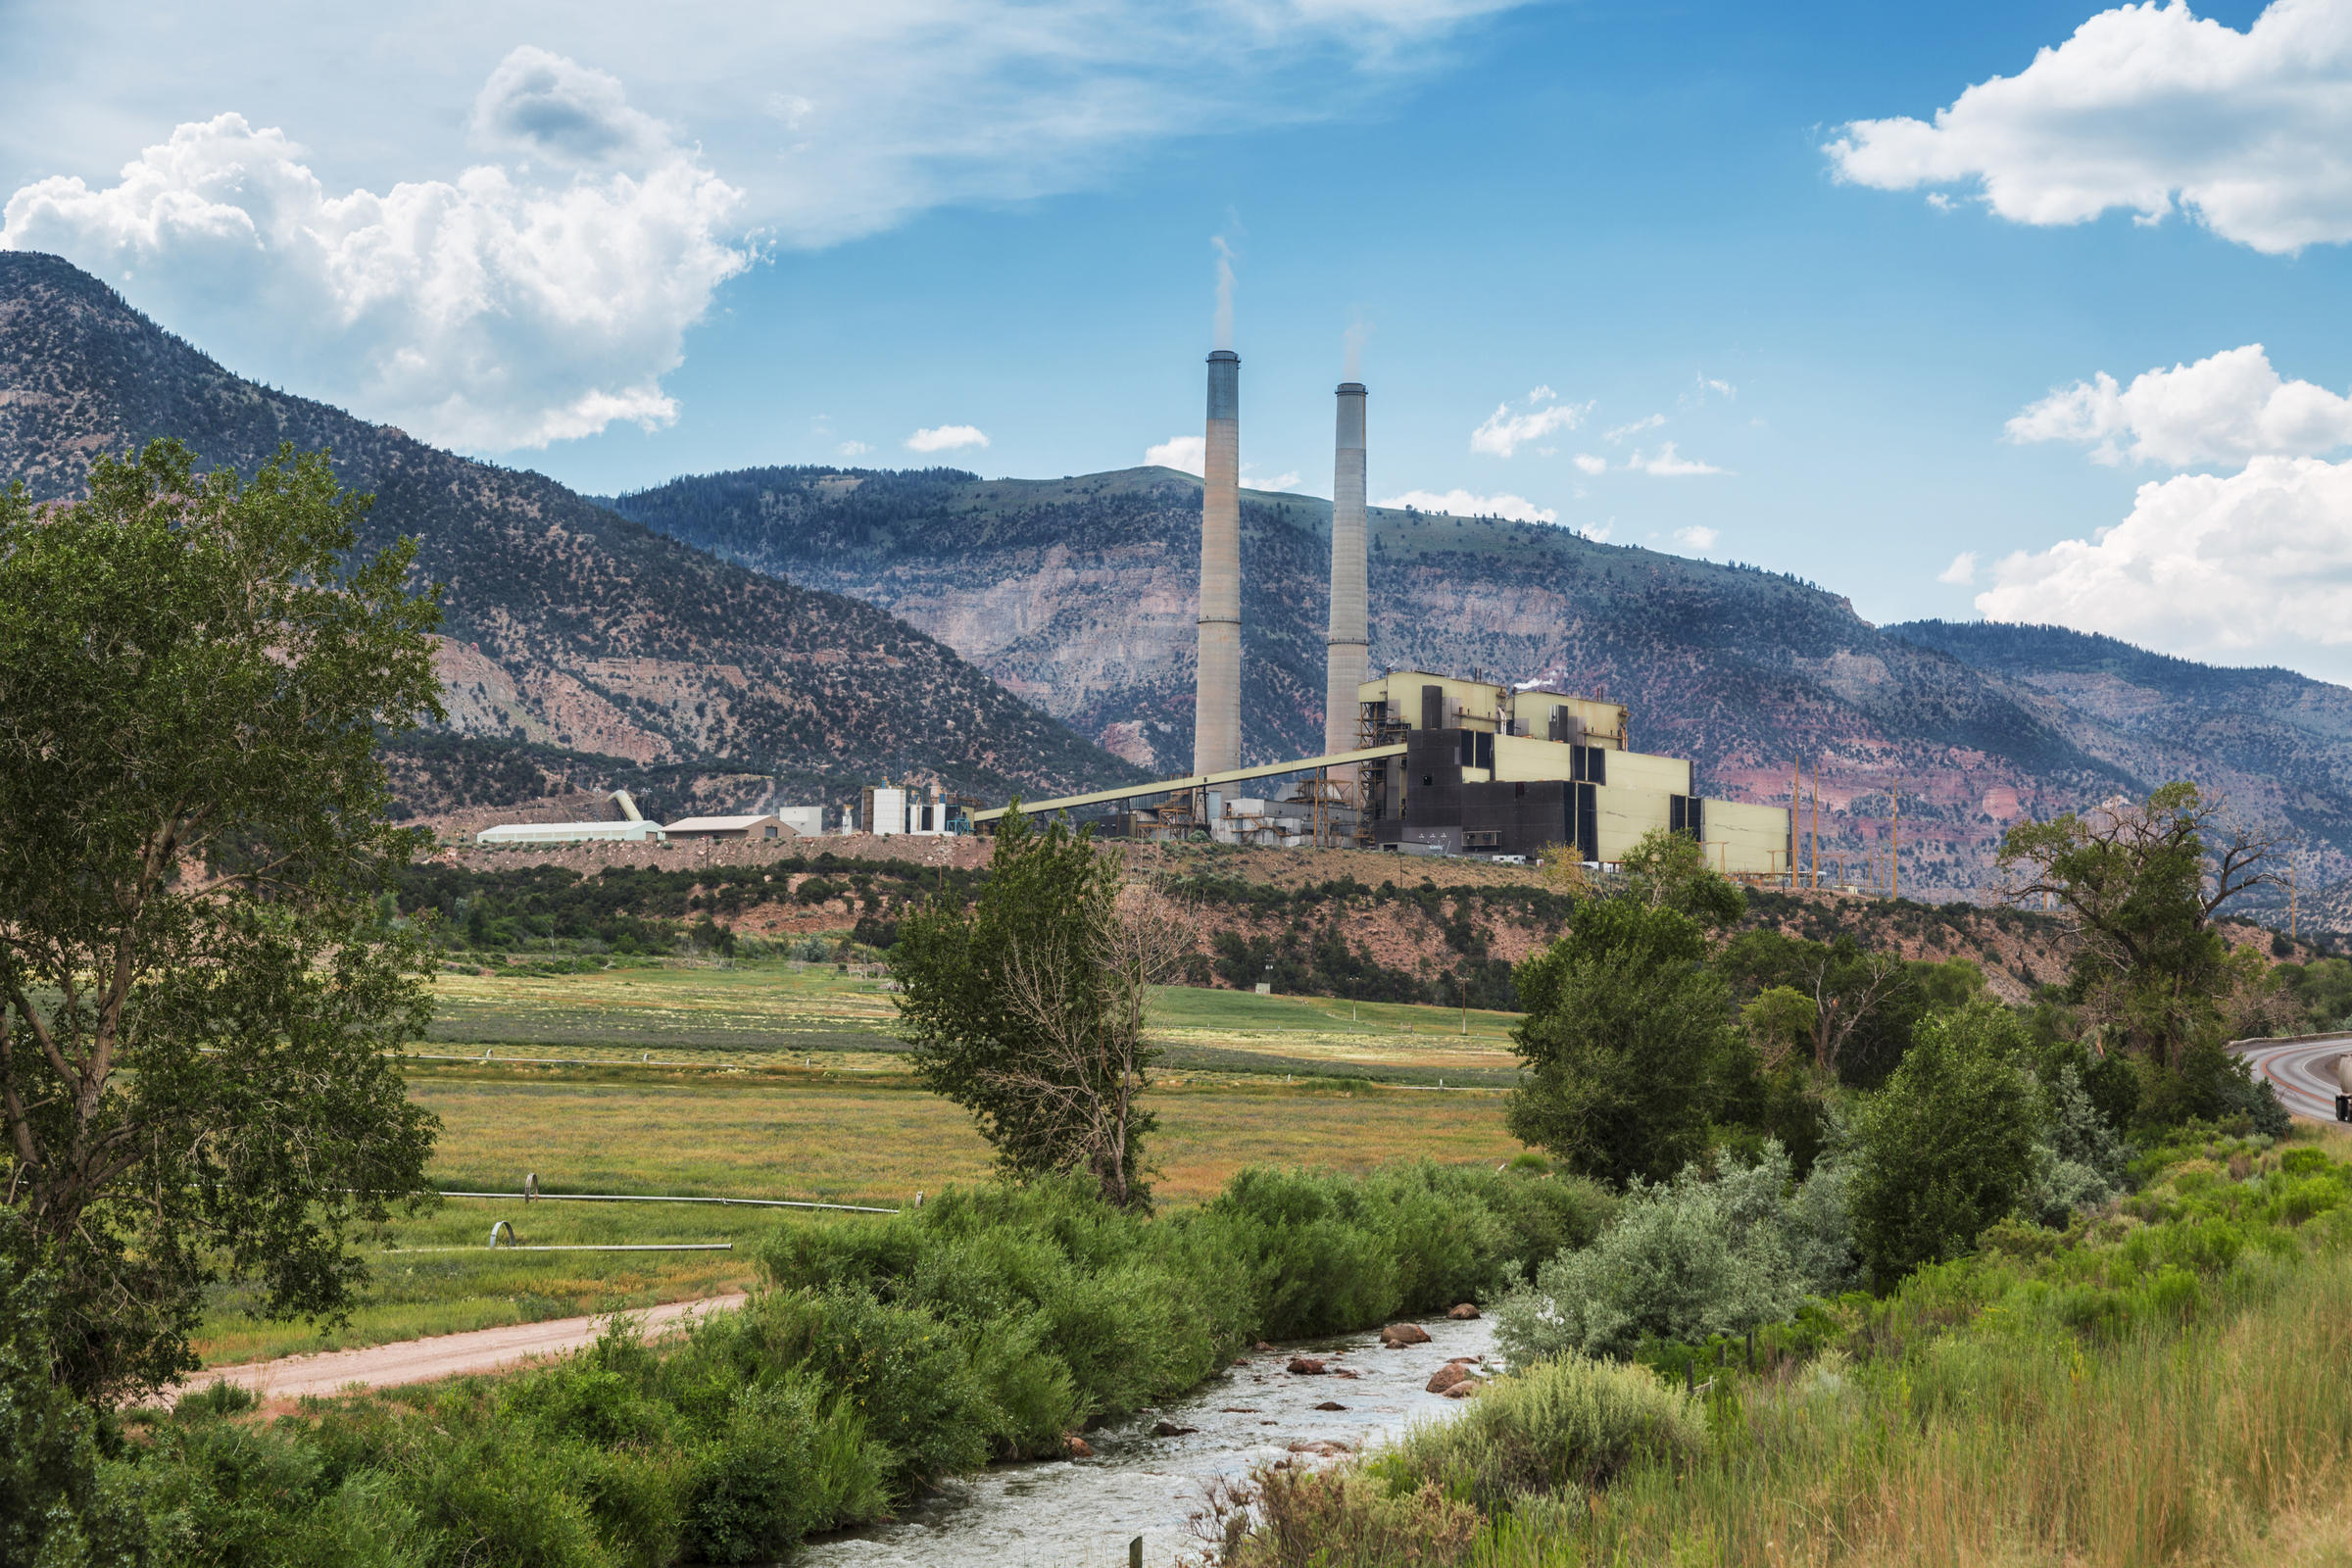 Trump to Announce Massive Rollback of Obama-Era Coal Regulations